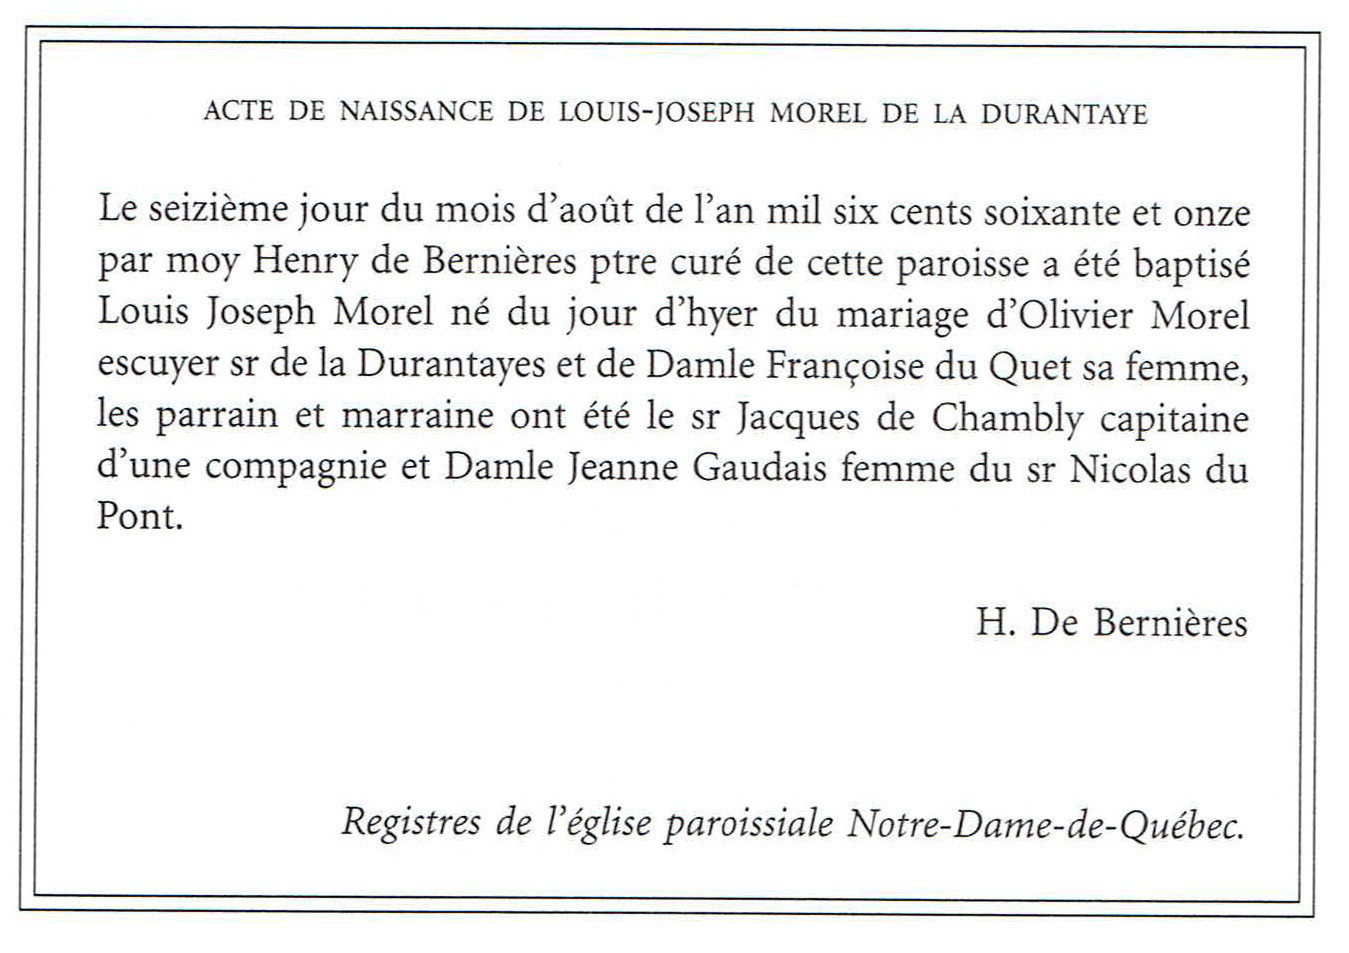 Joseph Morel